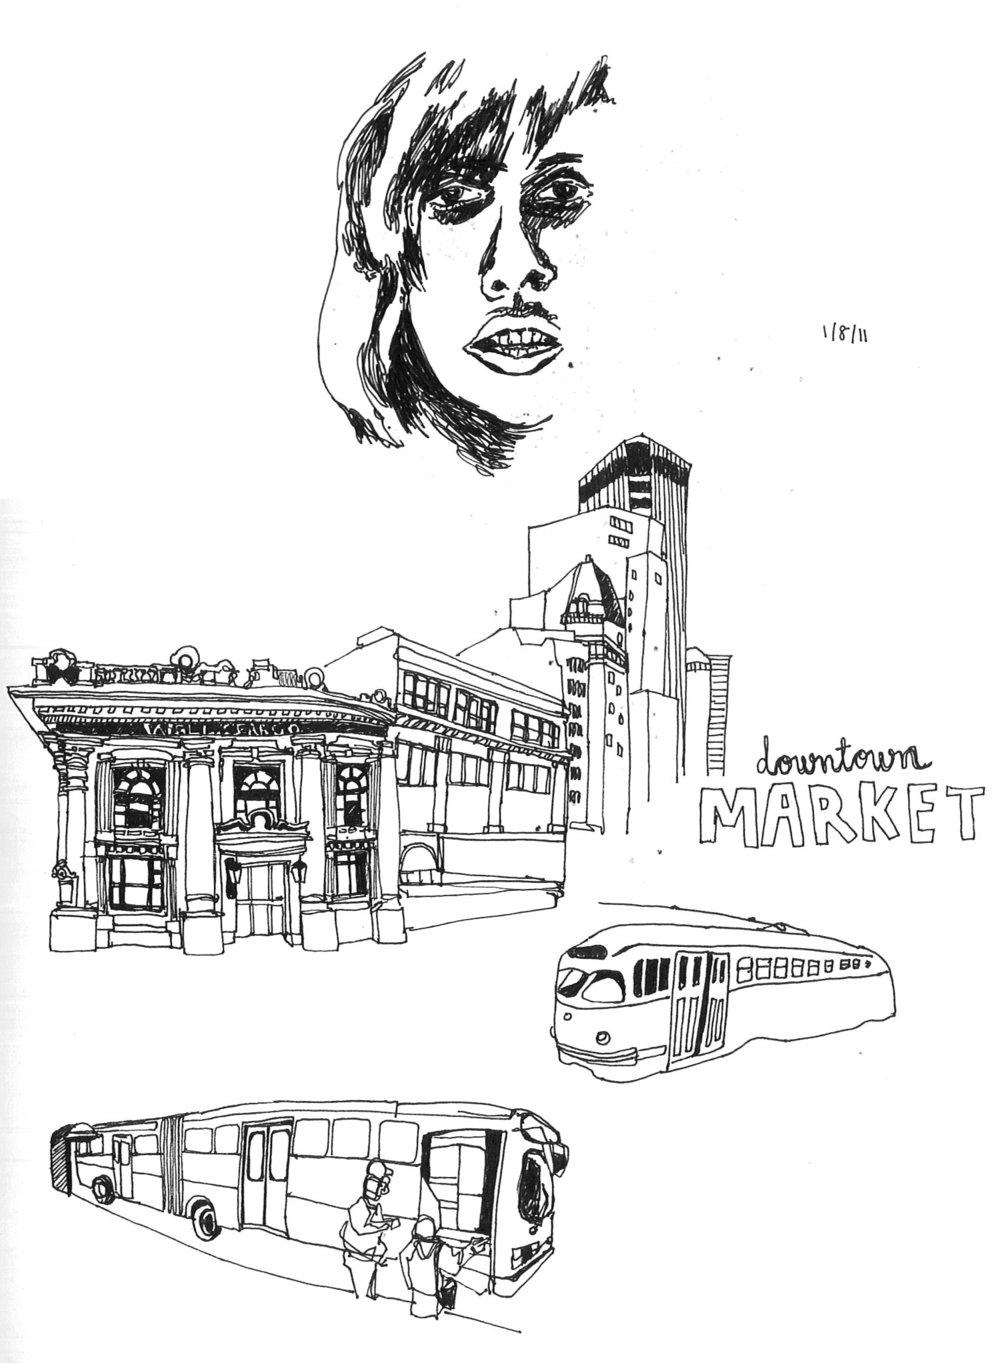 downtownmarket.jpg